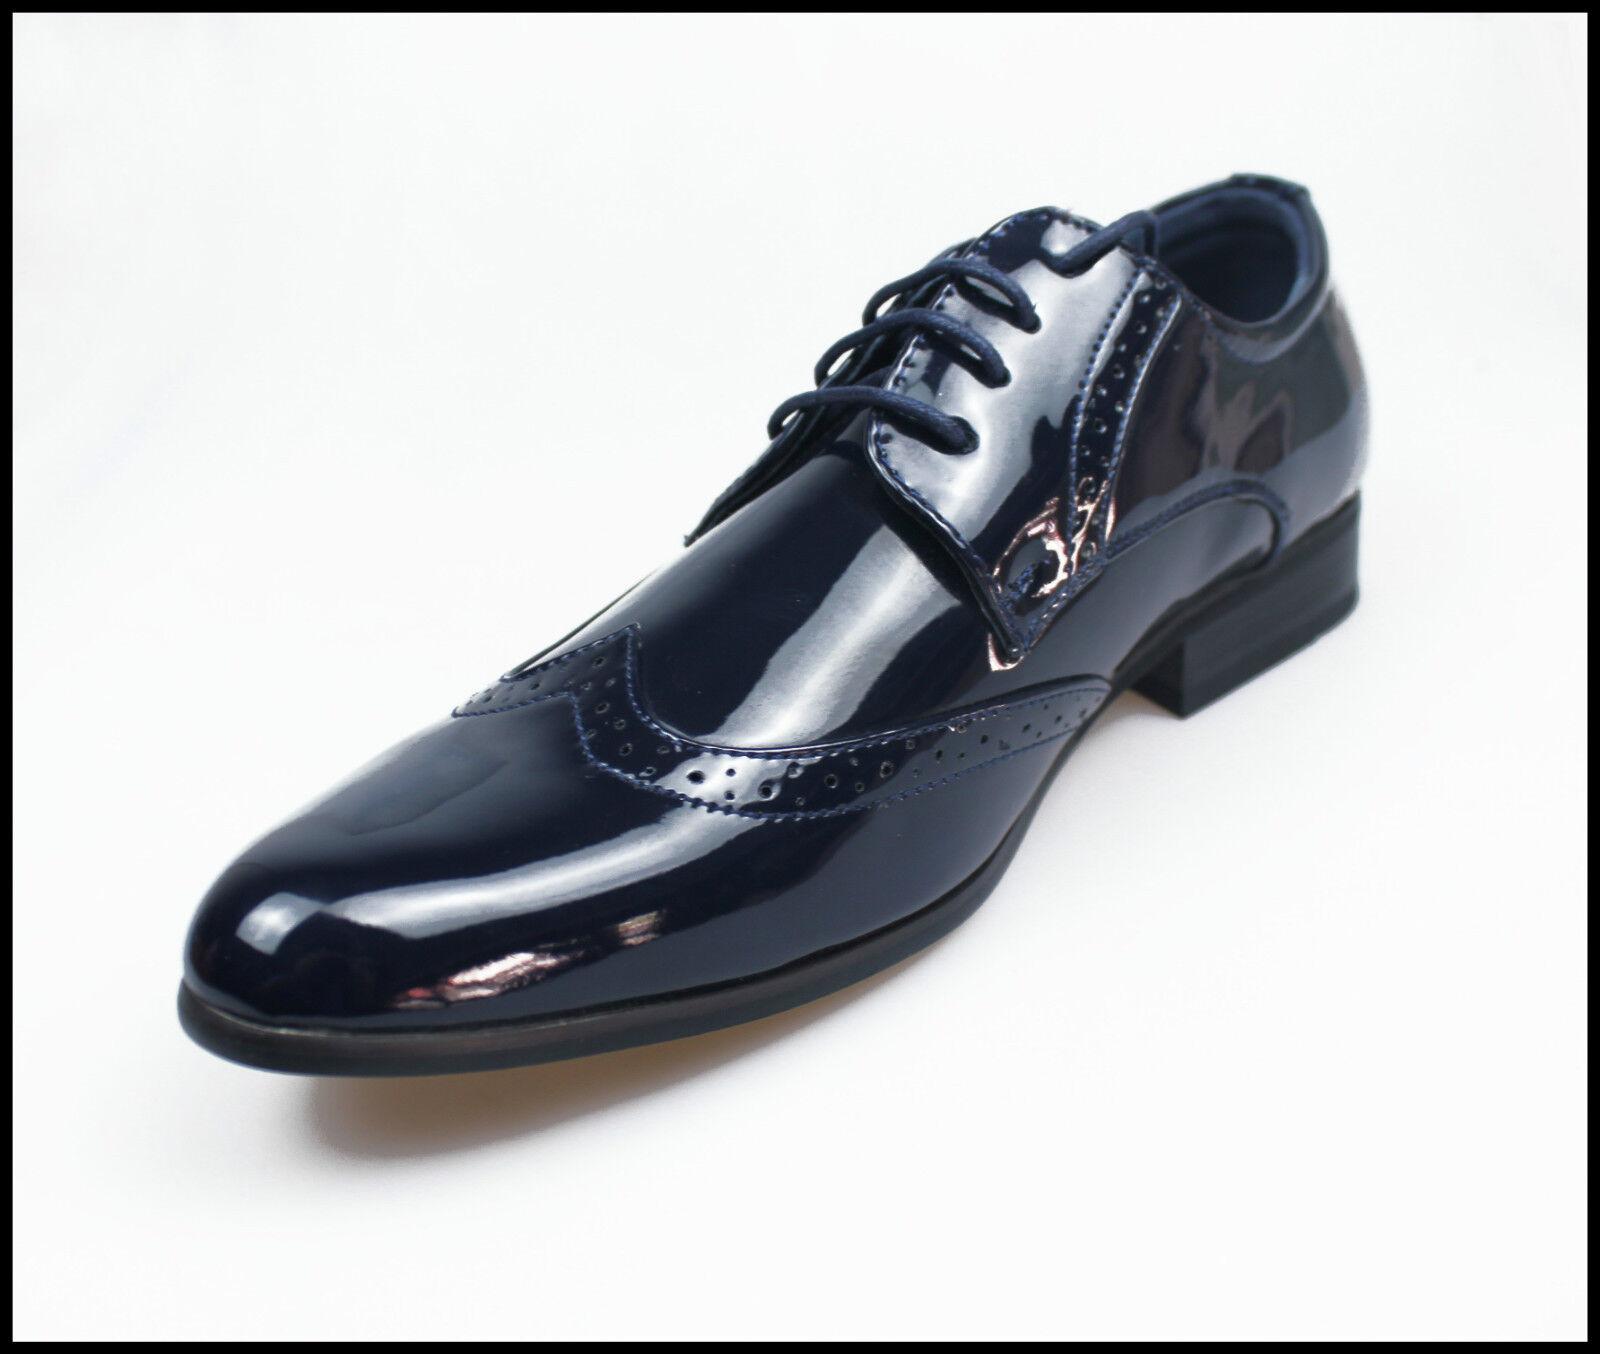 adidas nuovi modelli scarpe